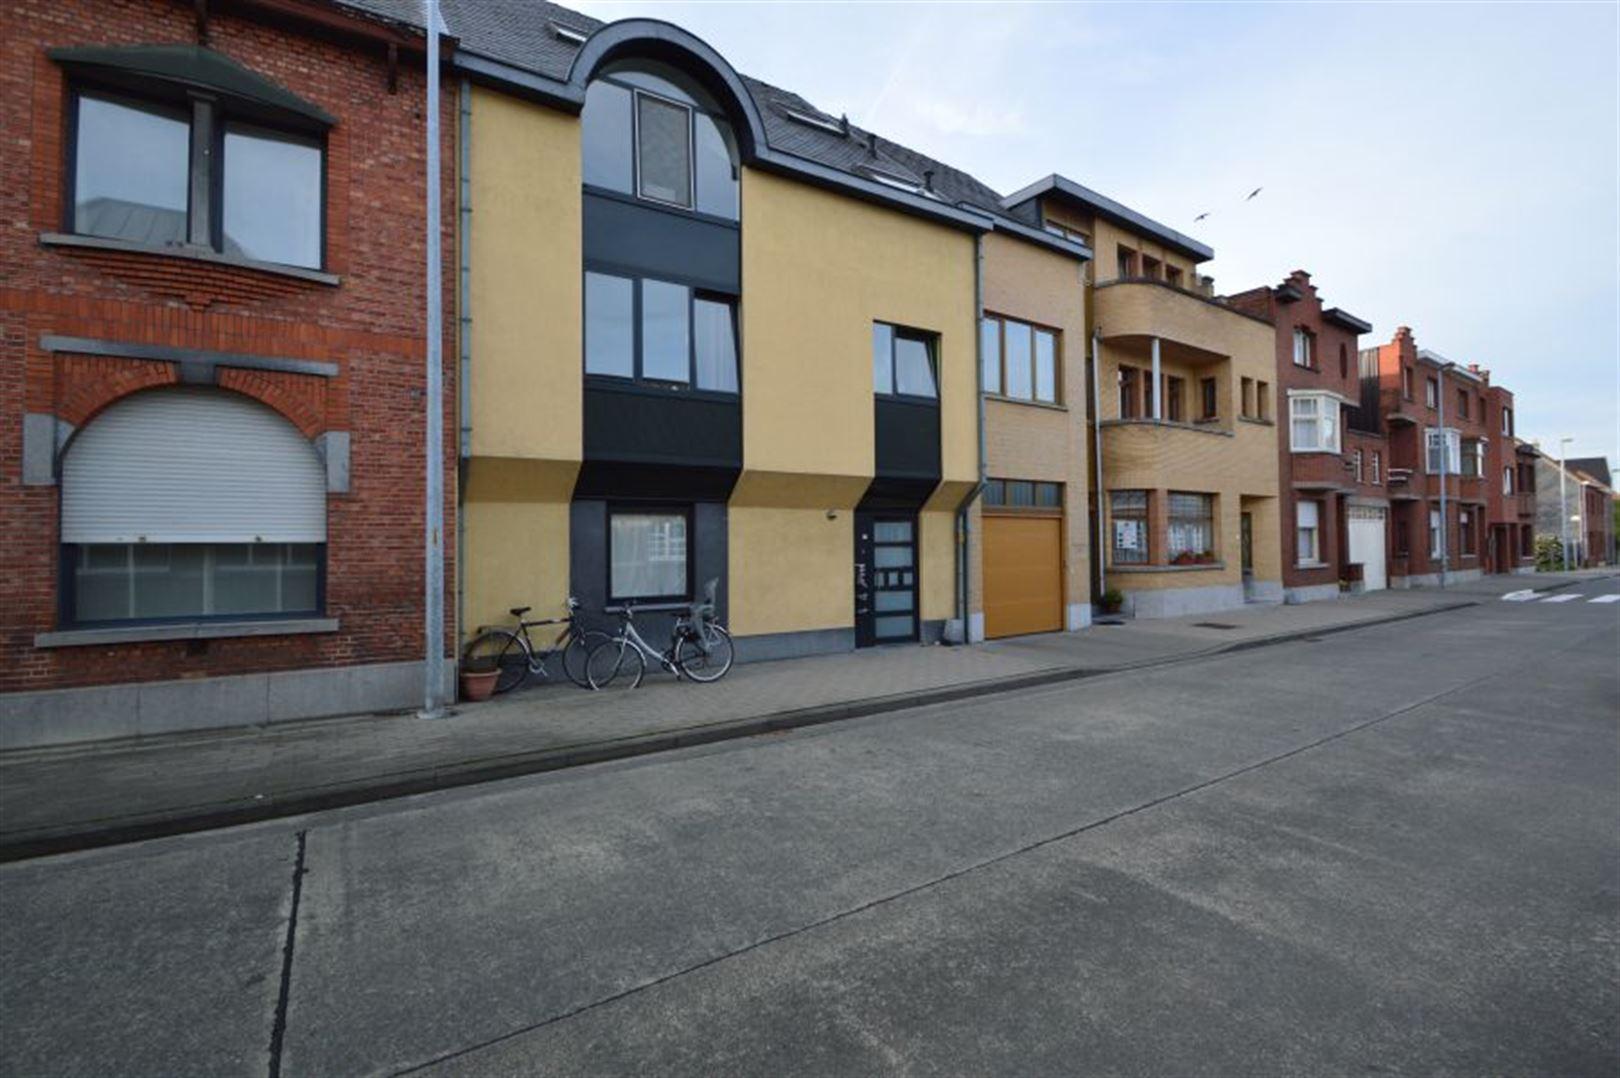 Foto 1 : Duplex/Penthouse te 9200 Baasrode (België) - Prijs € 585